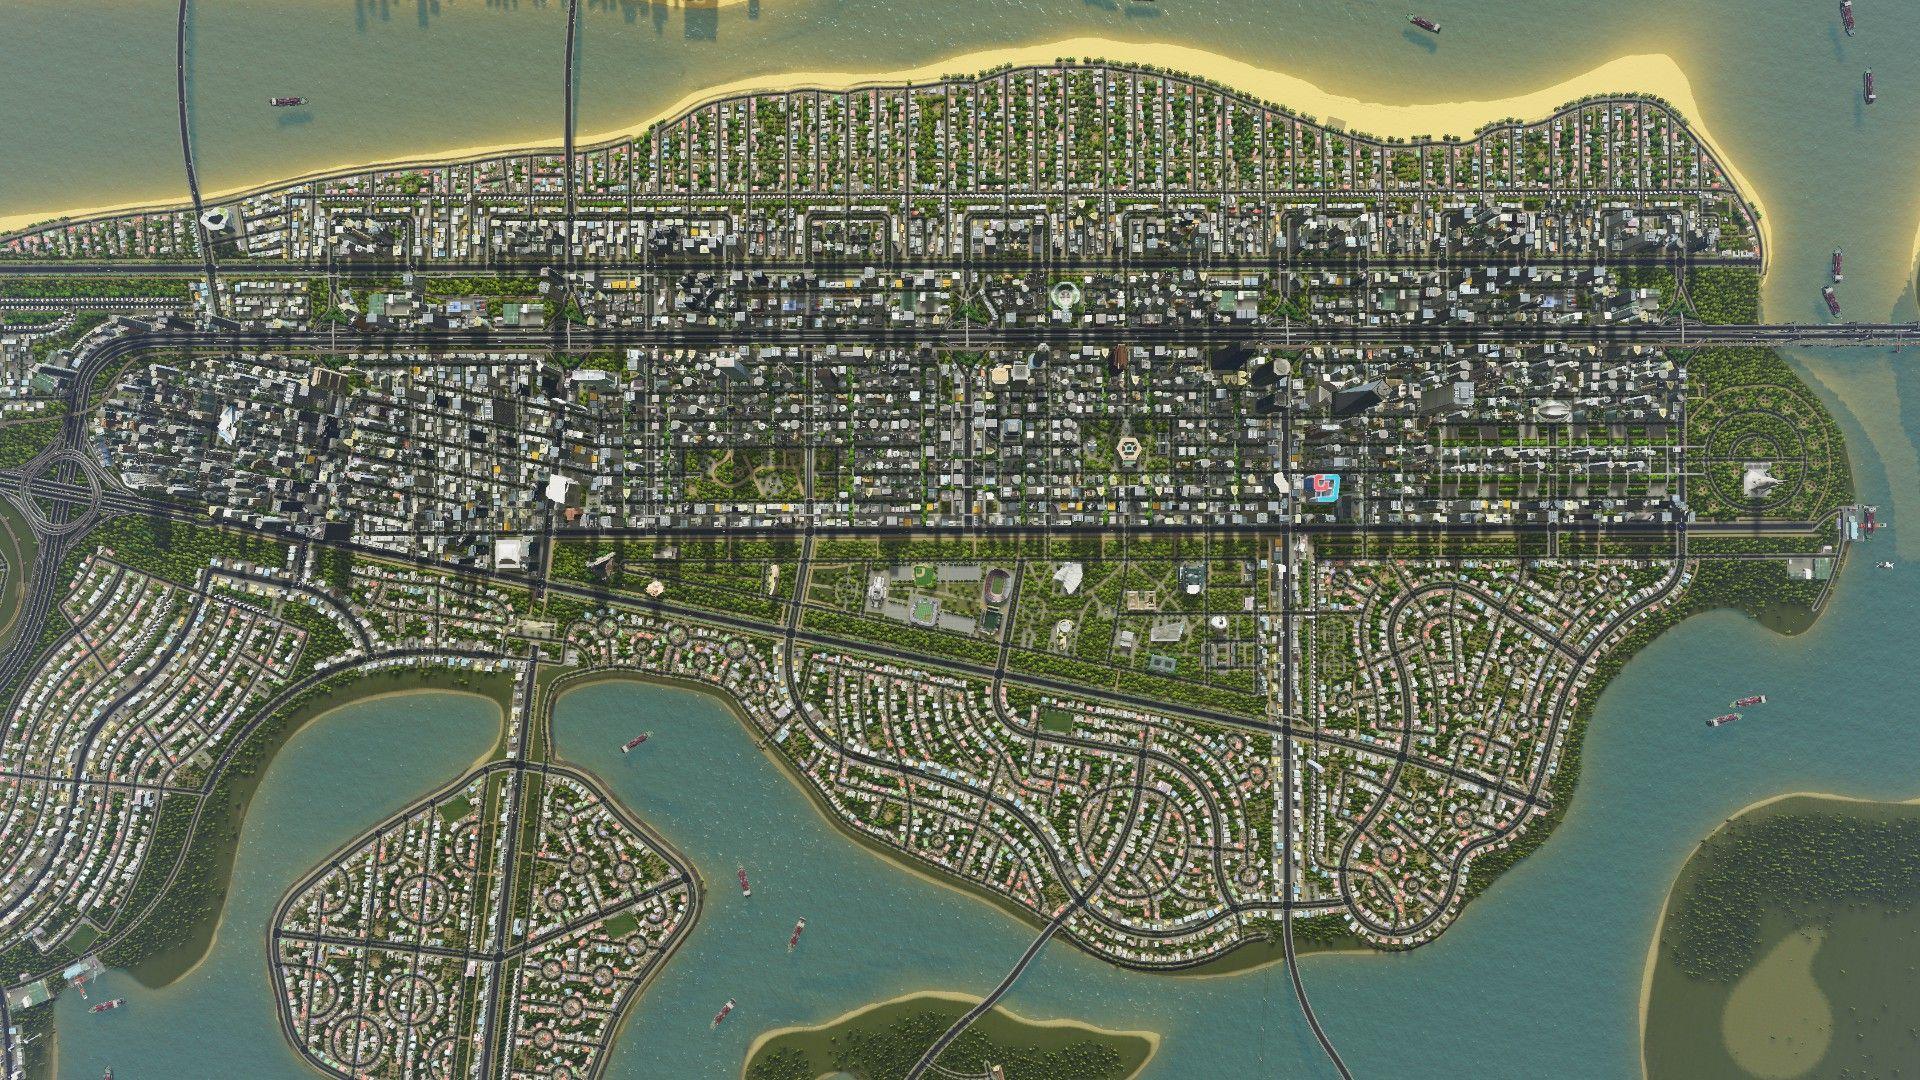 Pin On Cities Skylines